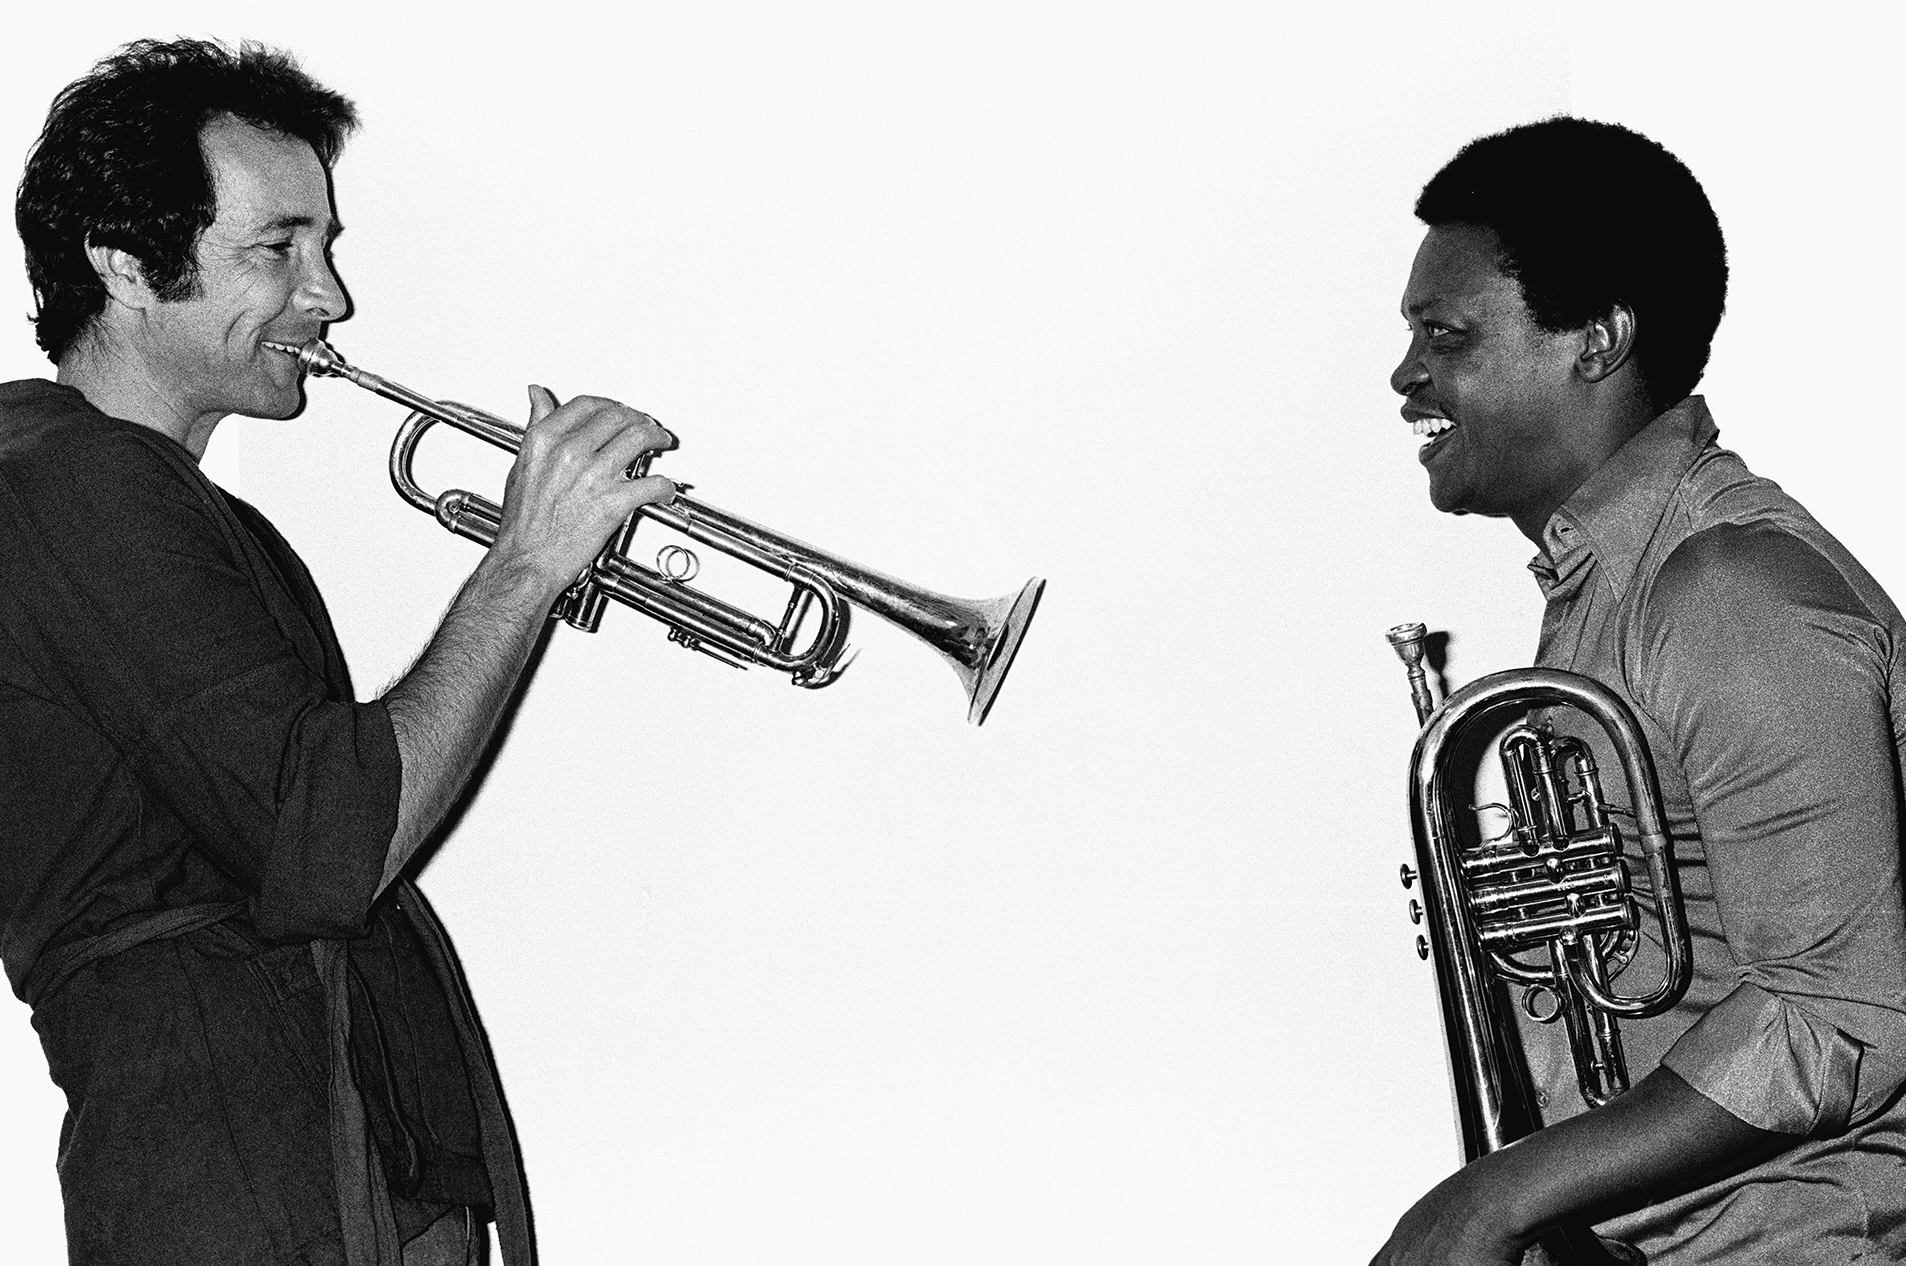 Herb Alpert and Hugh Masekela